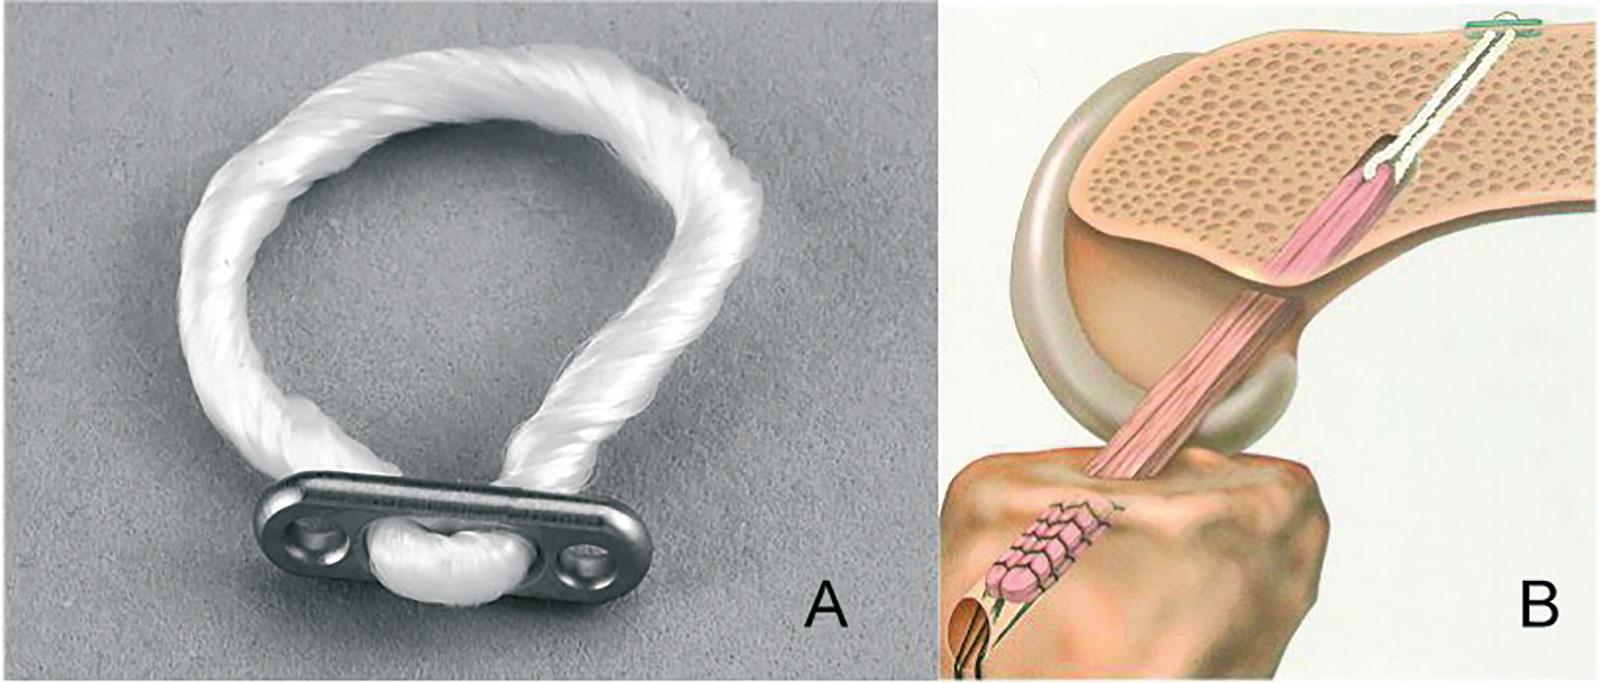 Abb. 2-43: Fixierung des Sehnengrafts im femoralen Bohrkanal mit einem Endobutton (Smith & Nephew GmbH)